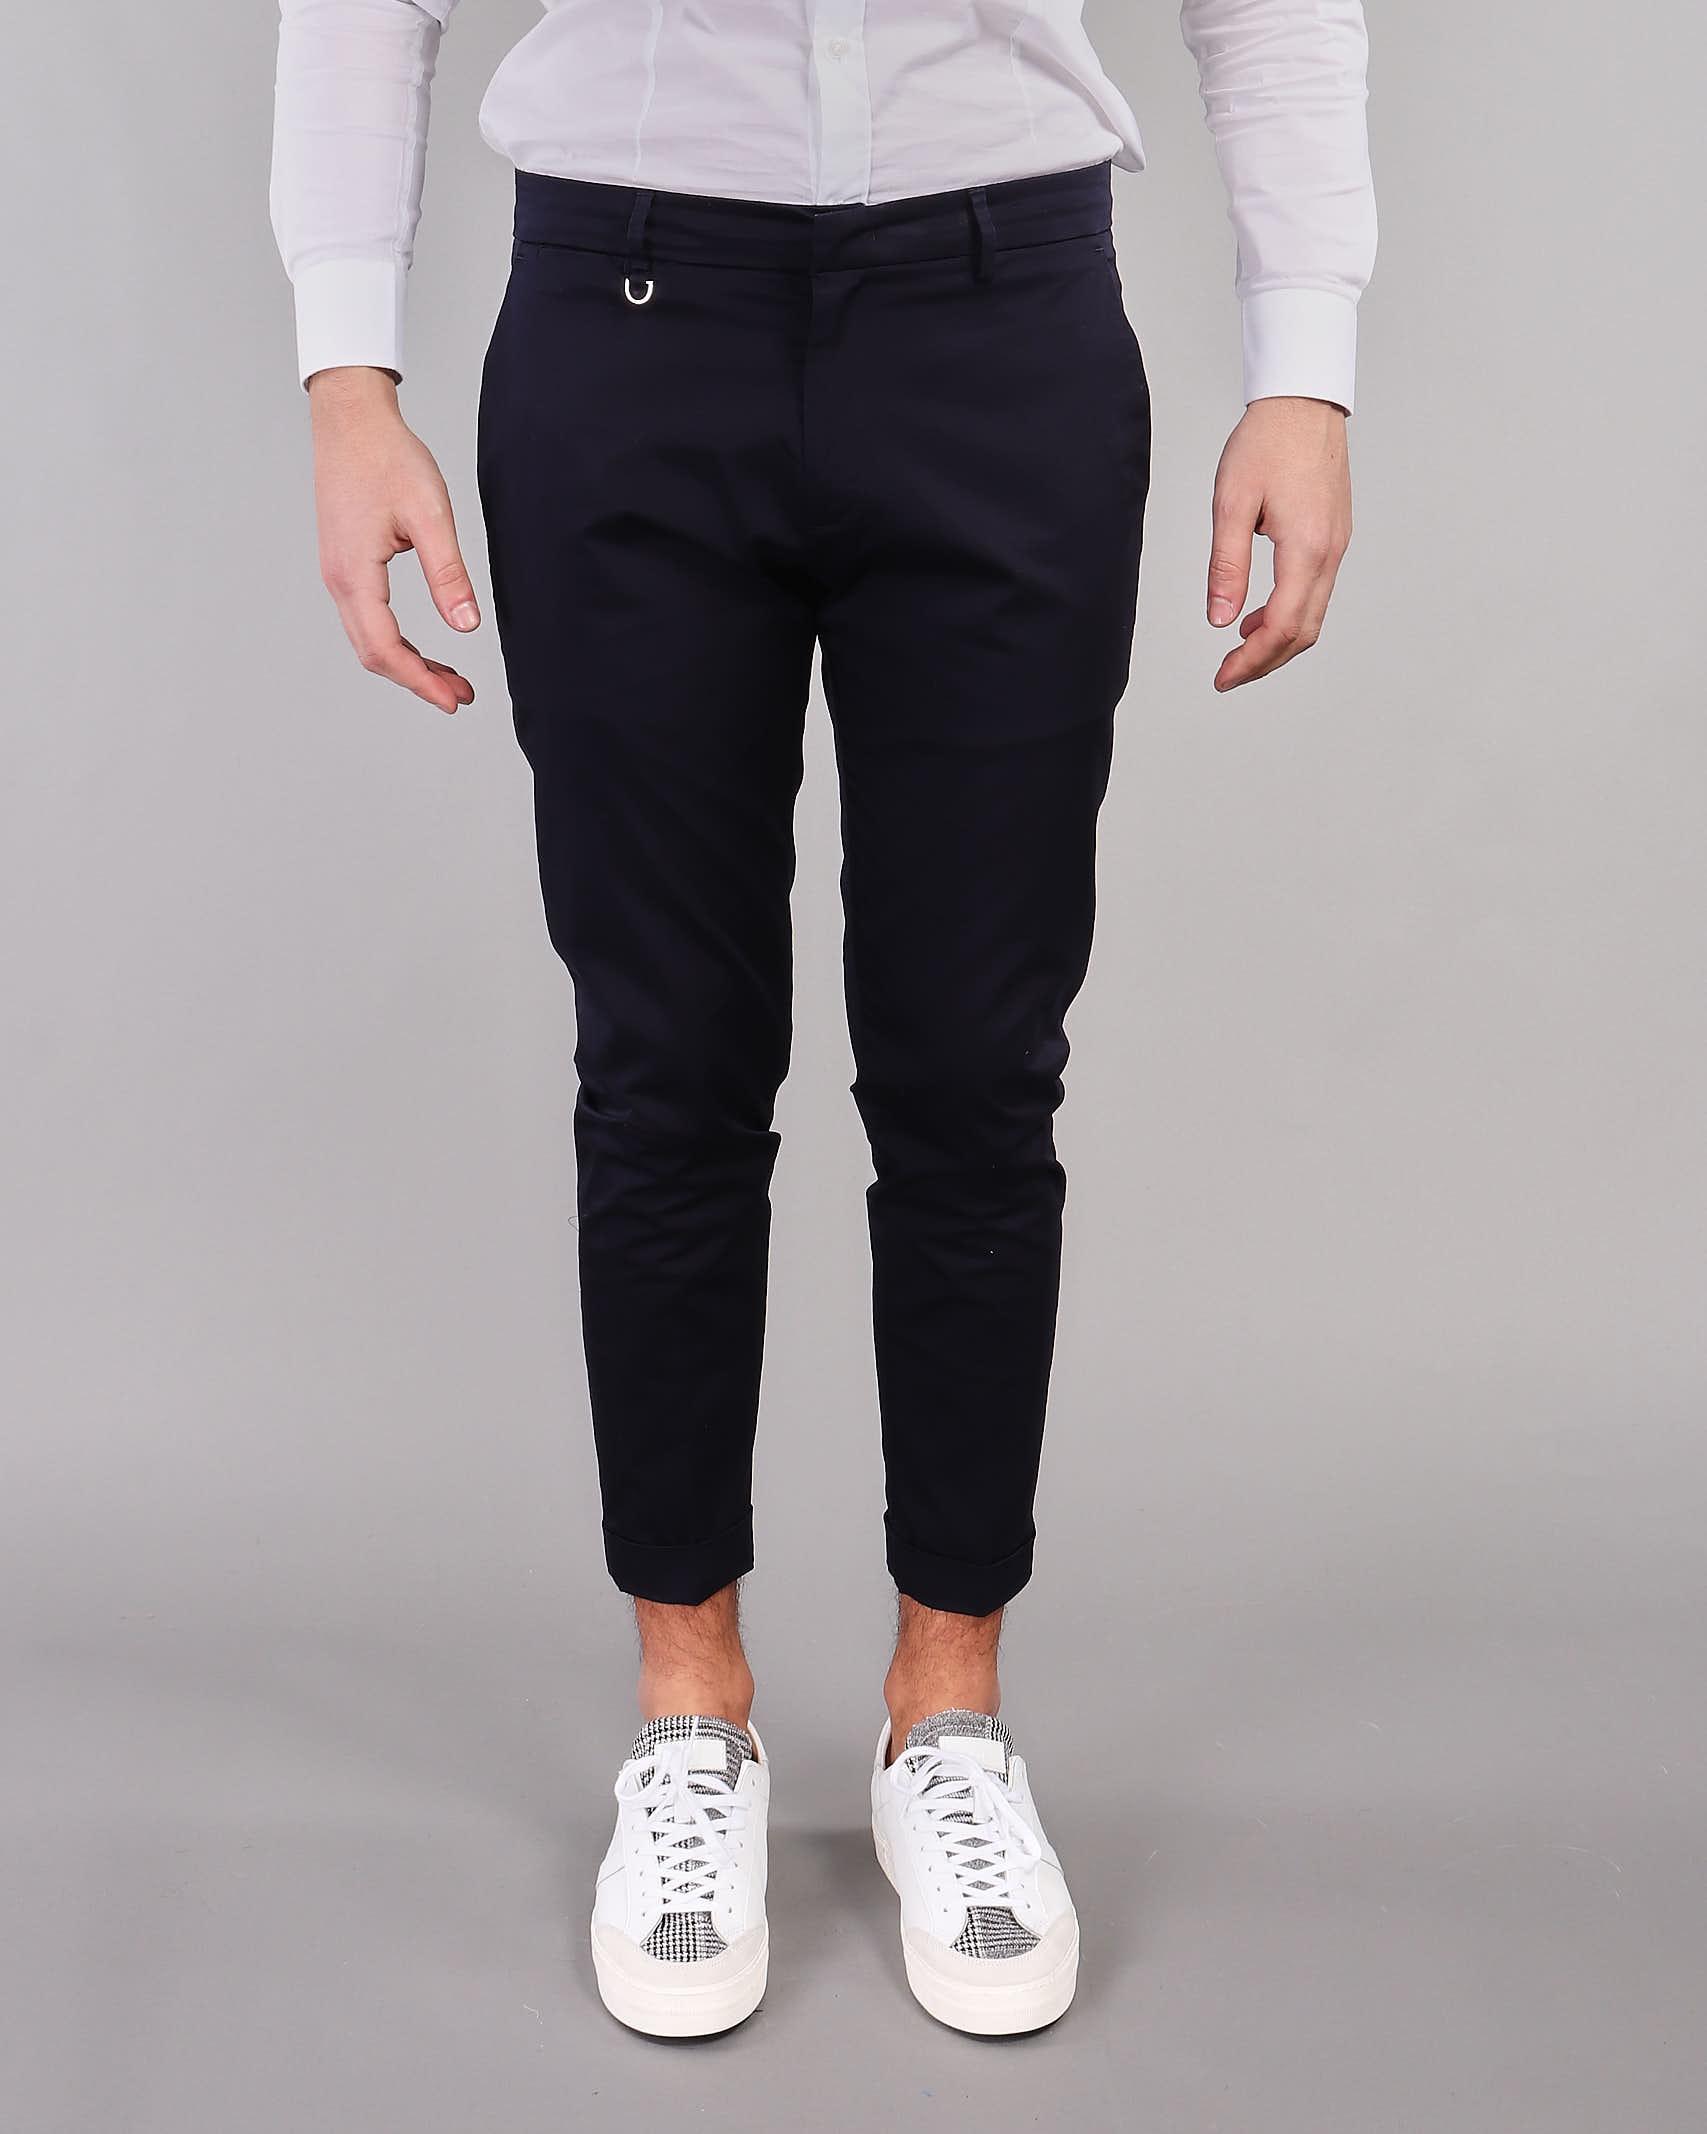 Pantalone in cotone di Golden Craft GOLDEN CRAFT | Pantalone | GC1PSS215880E044